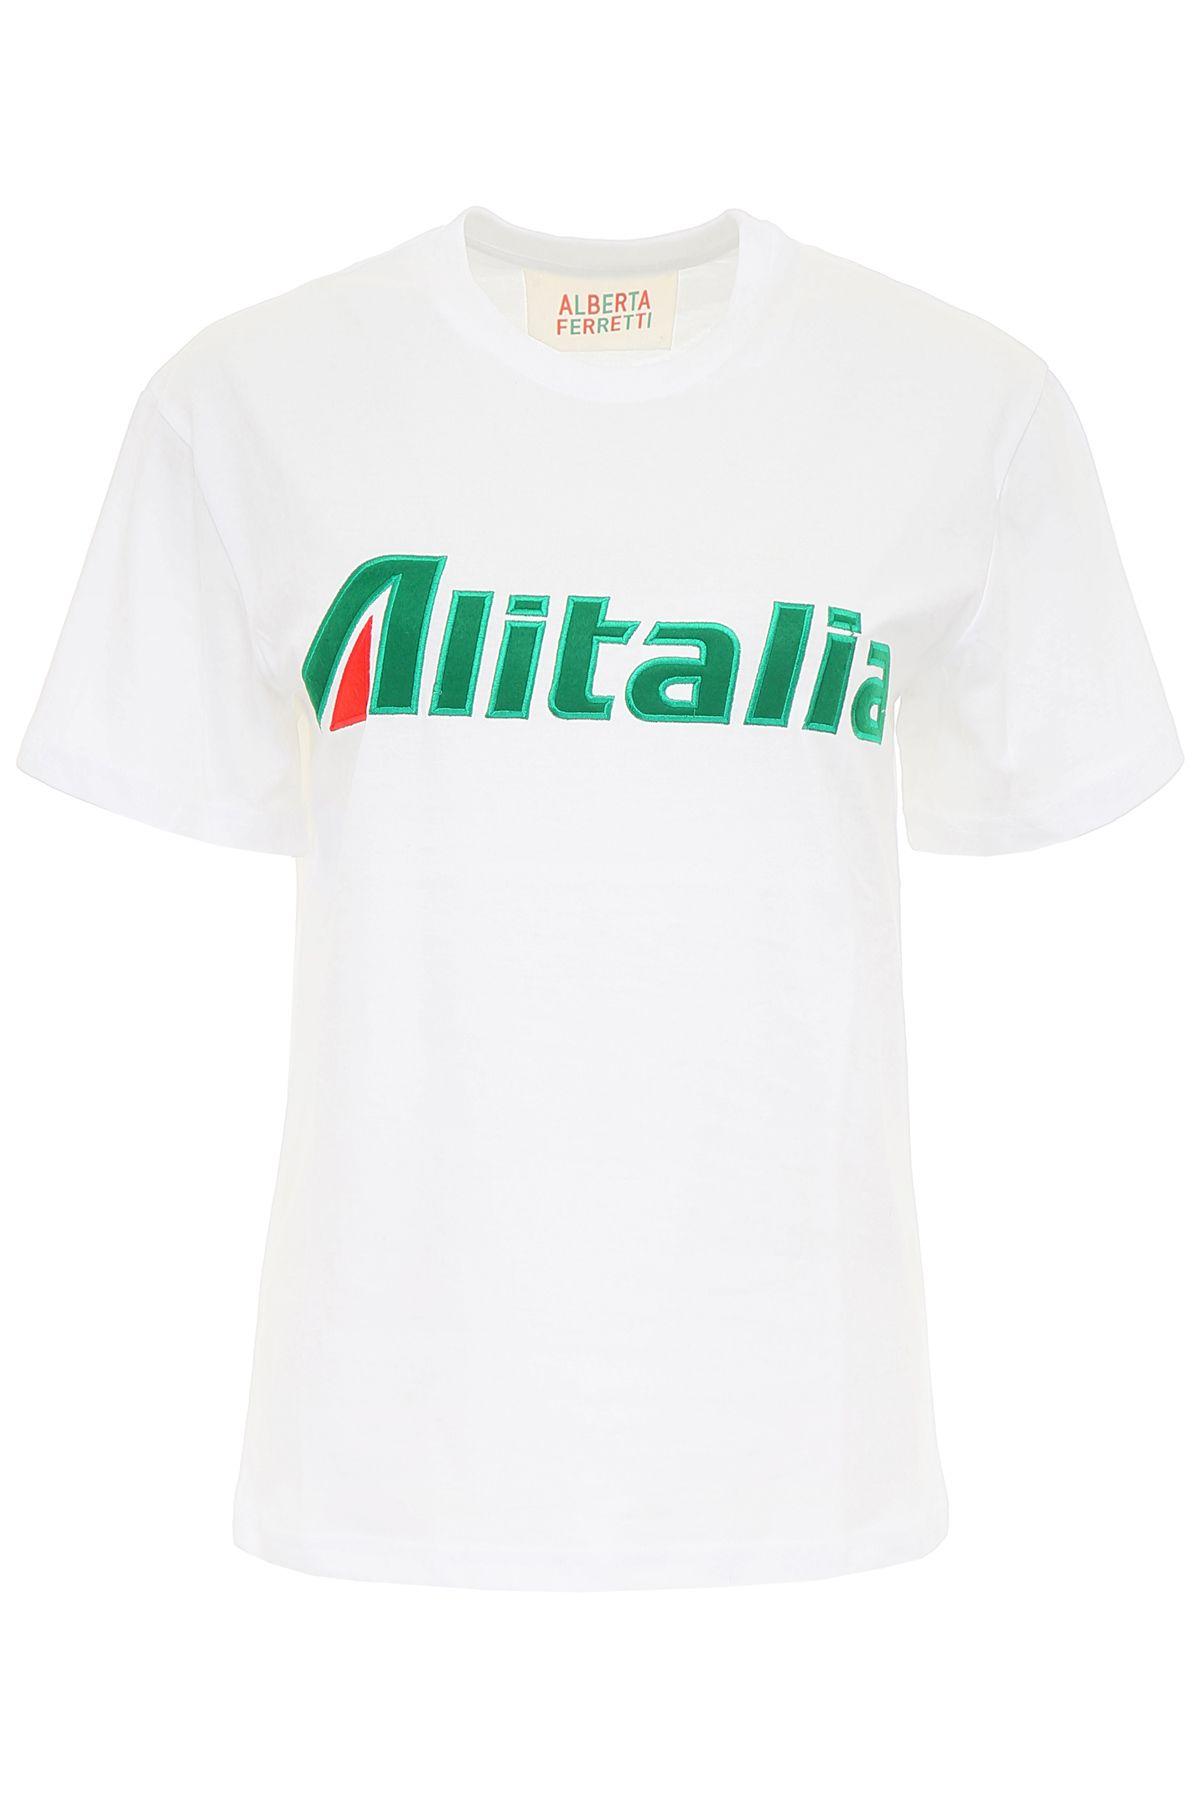 ALITALIA T-SHIRT